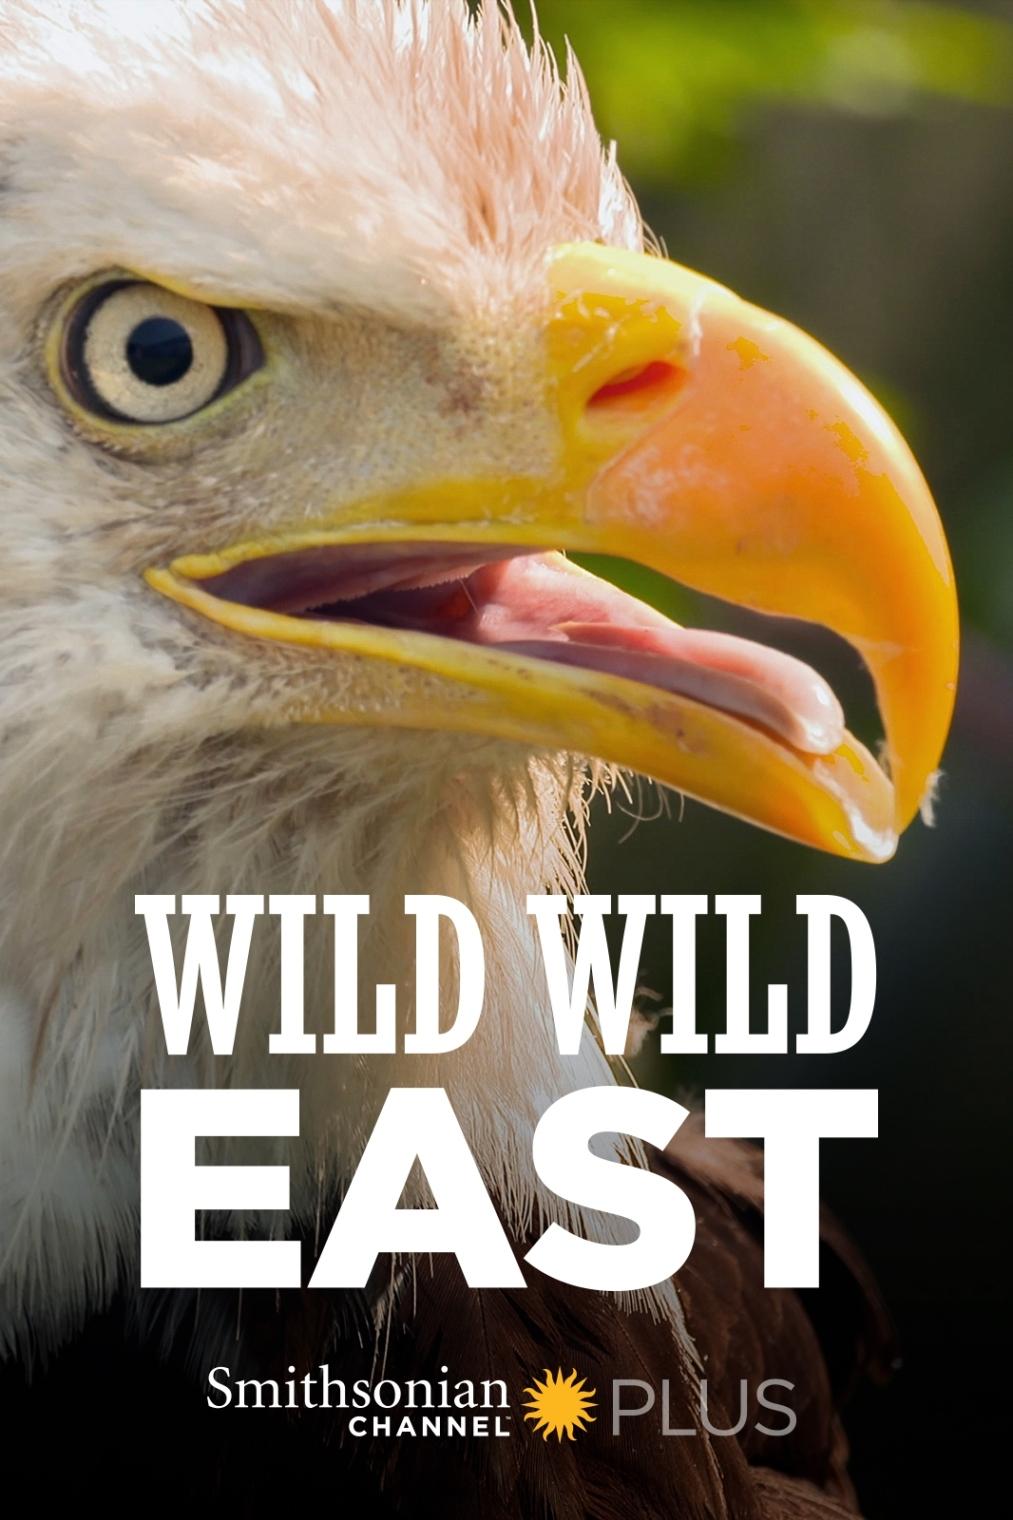 Wild Wild East kapak